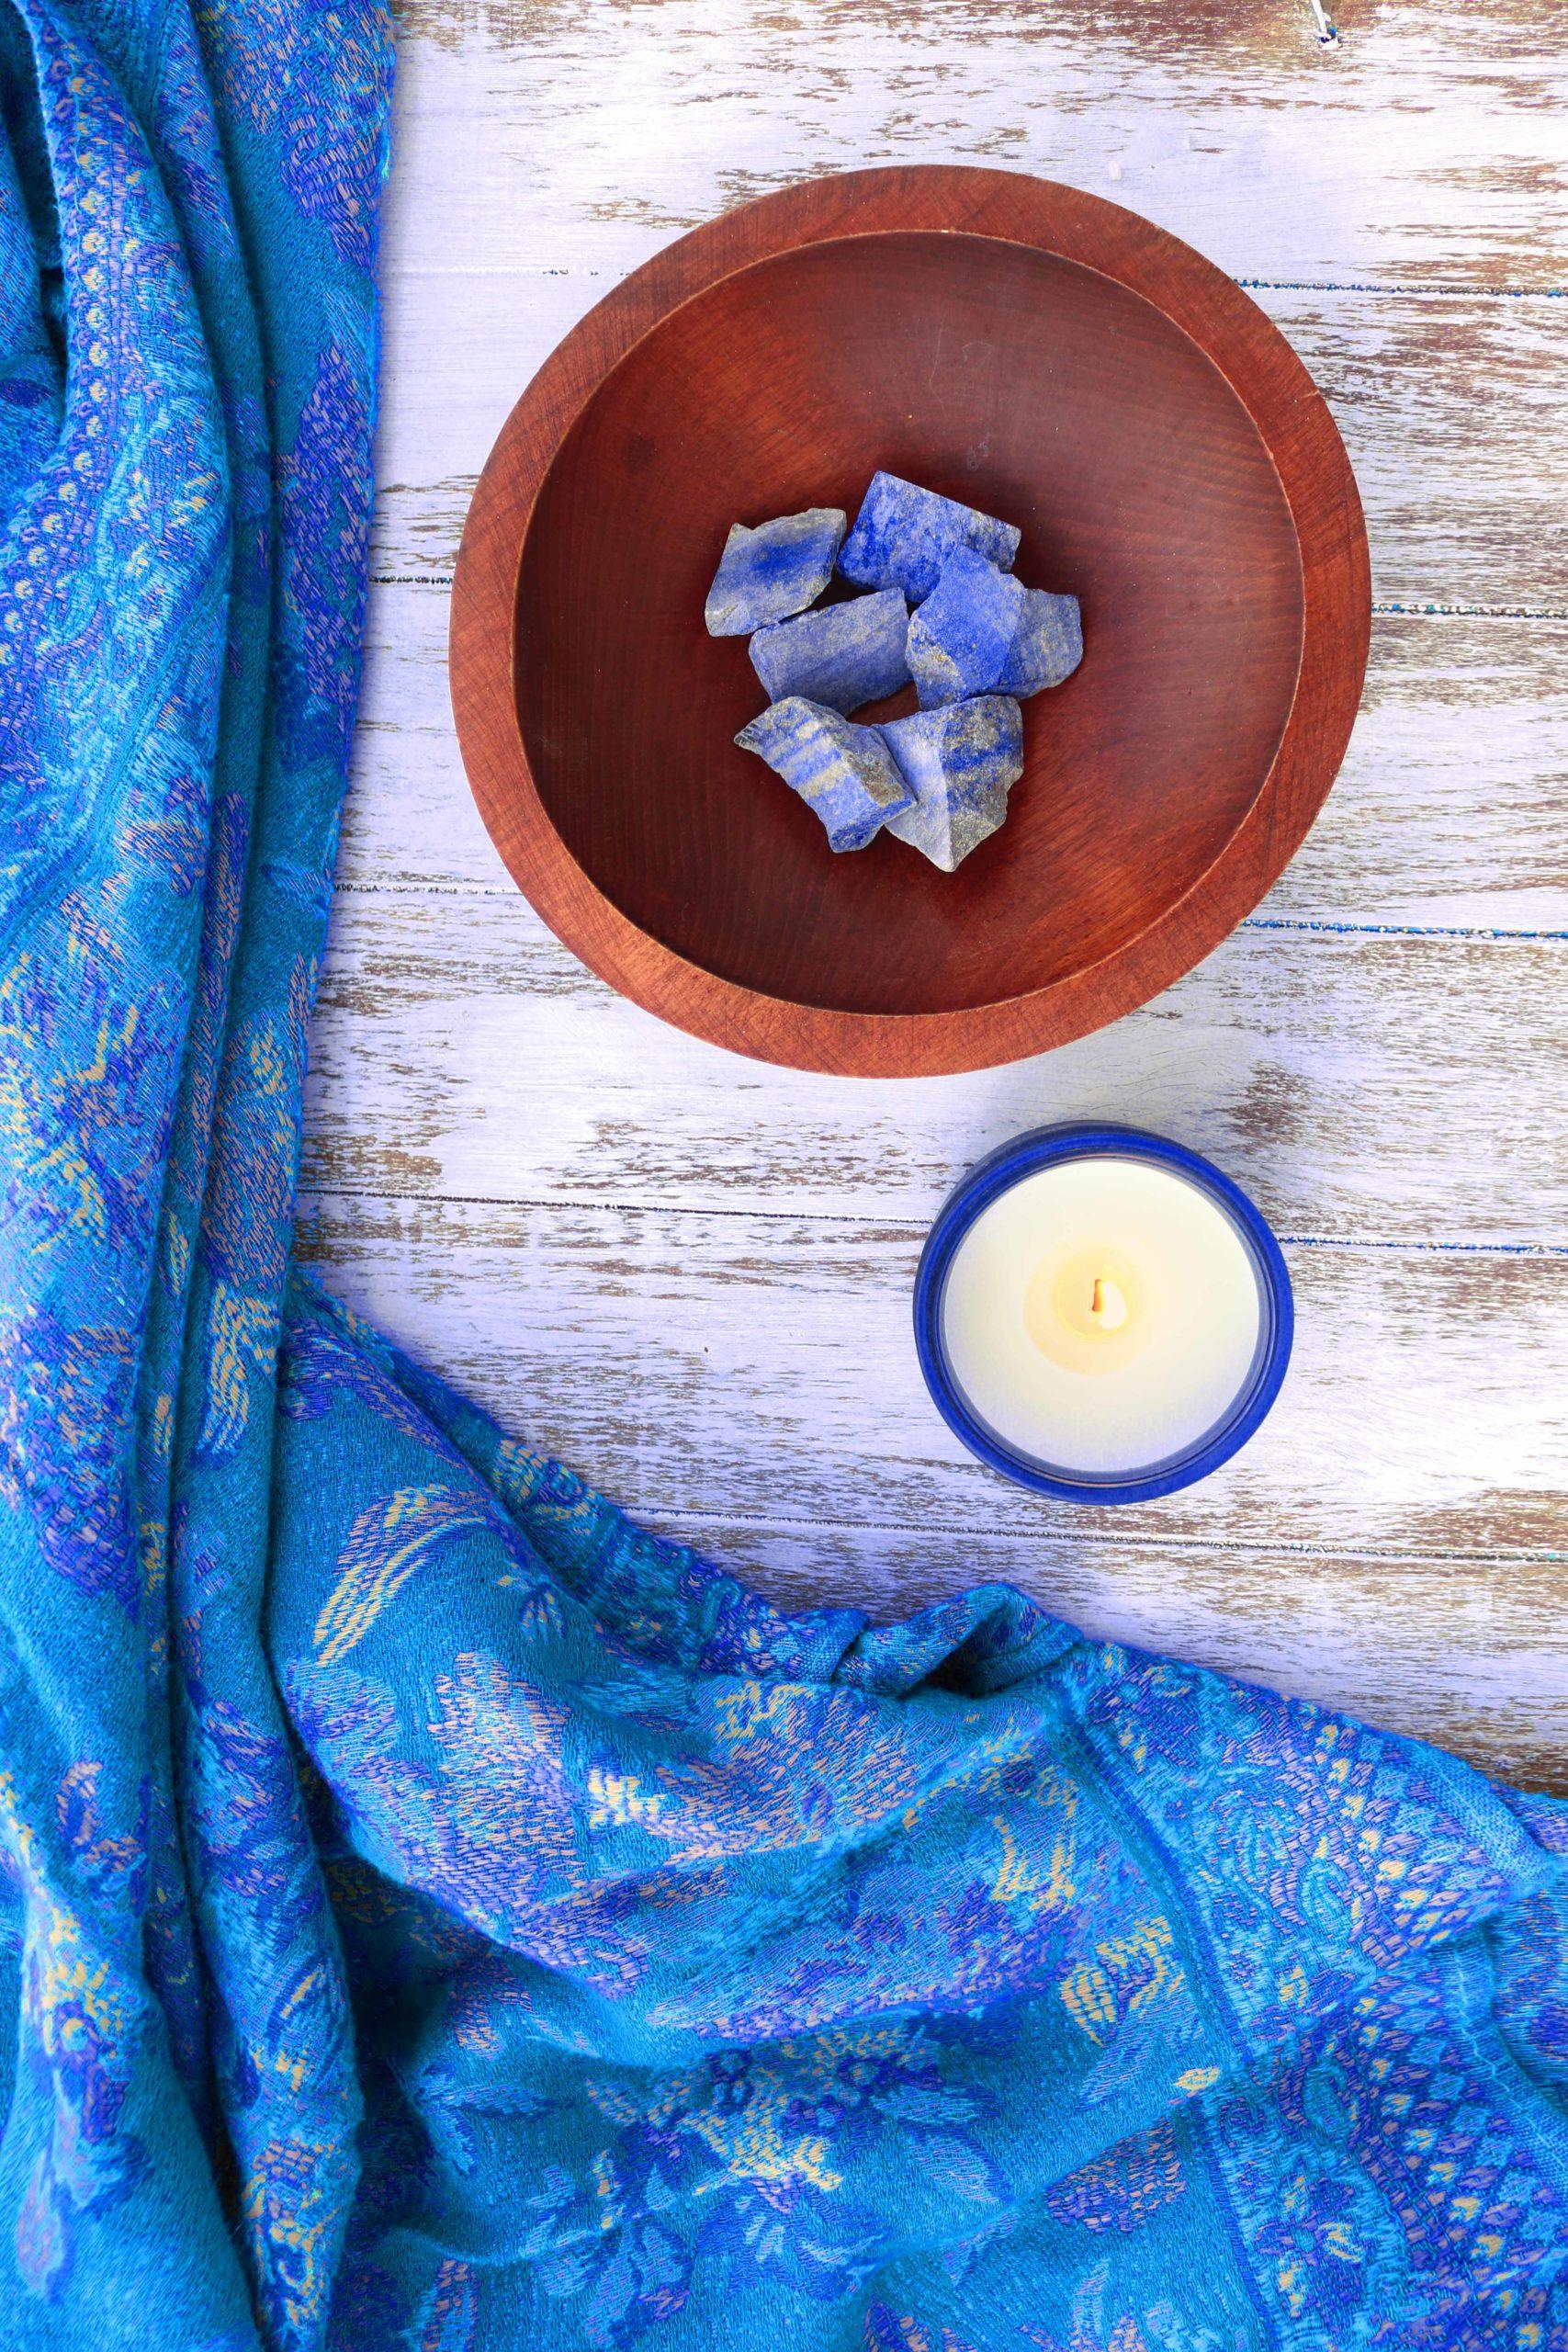 Got some lapis lazuli lying around? Here's 9 creative ways to use this beautiful blue stone.